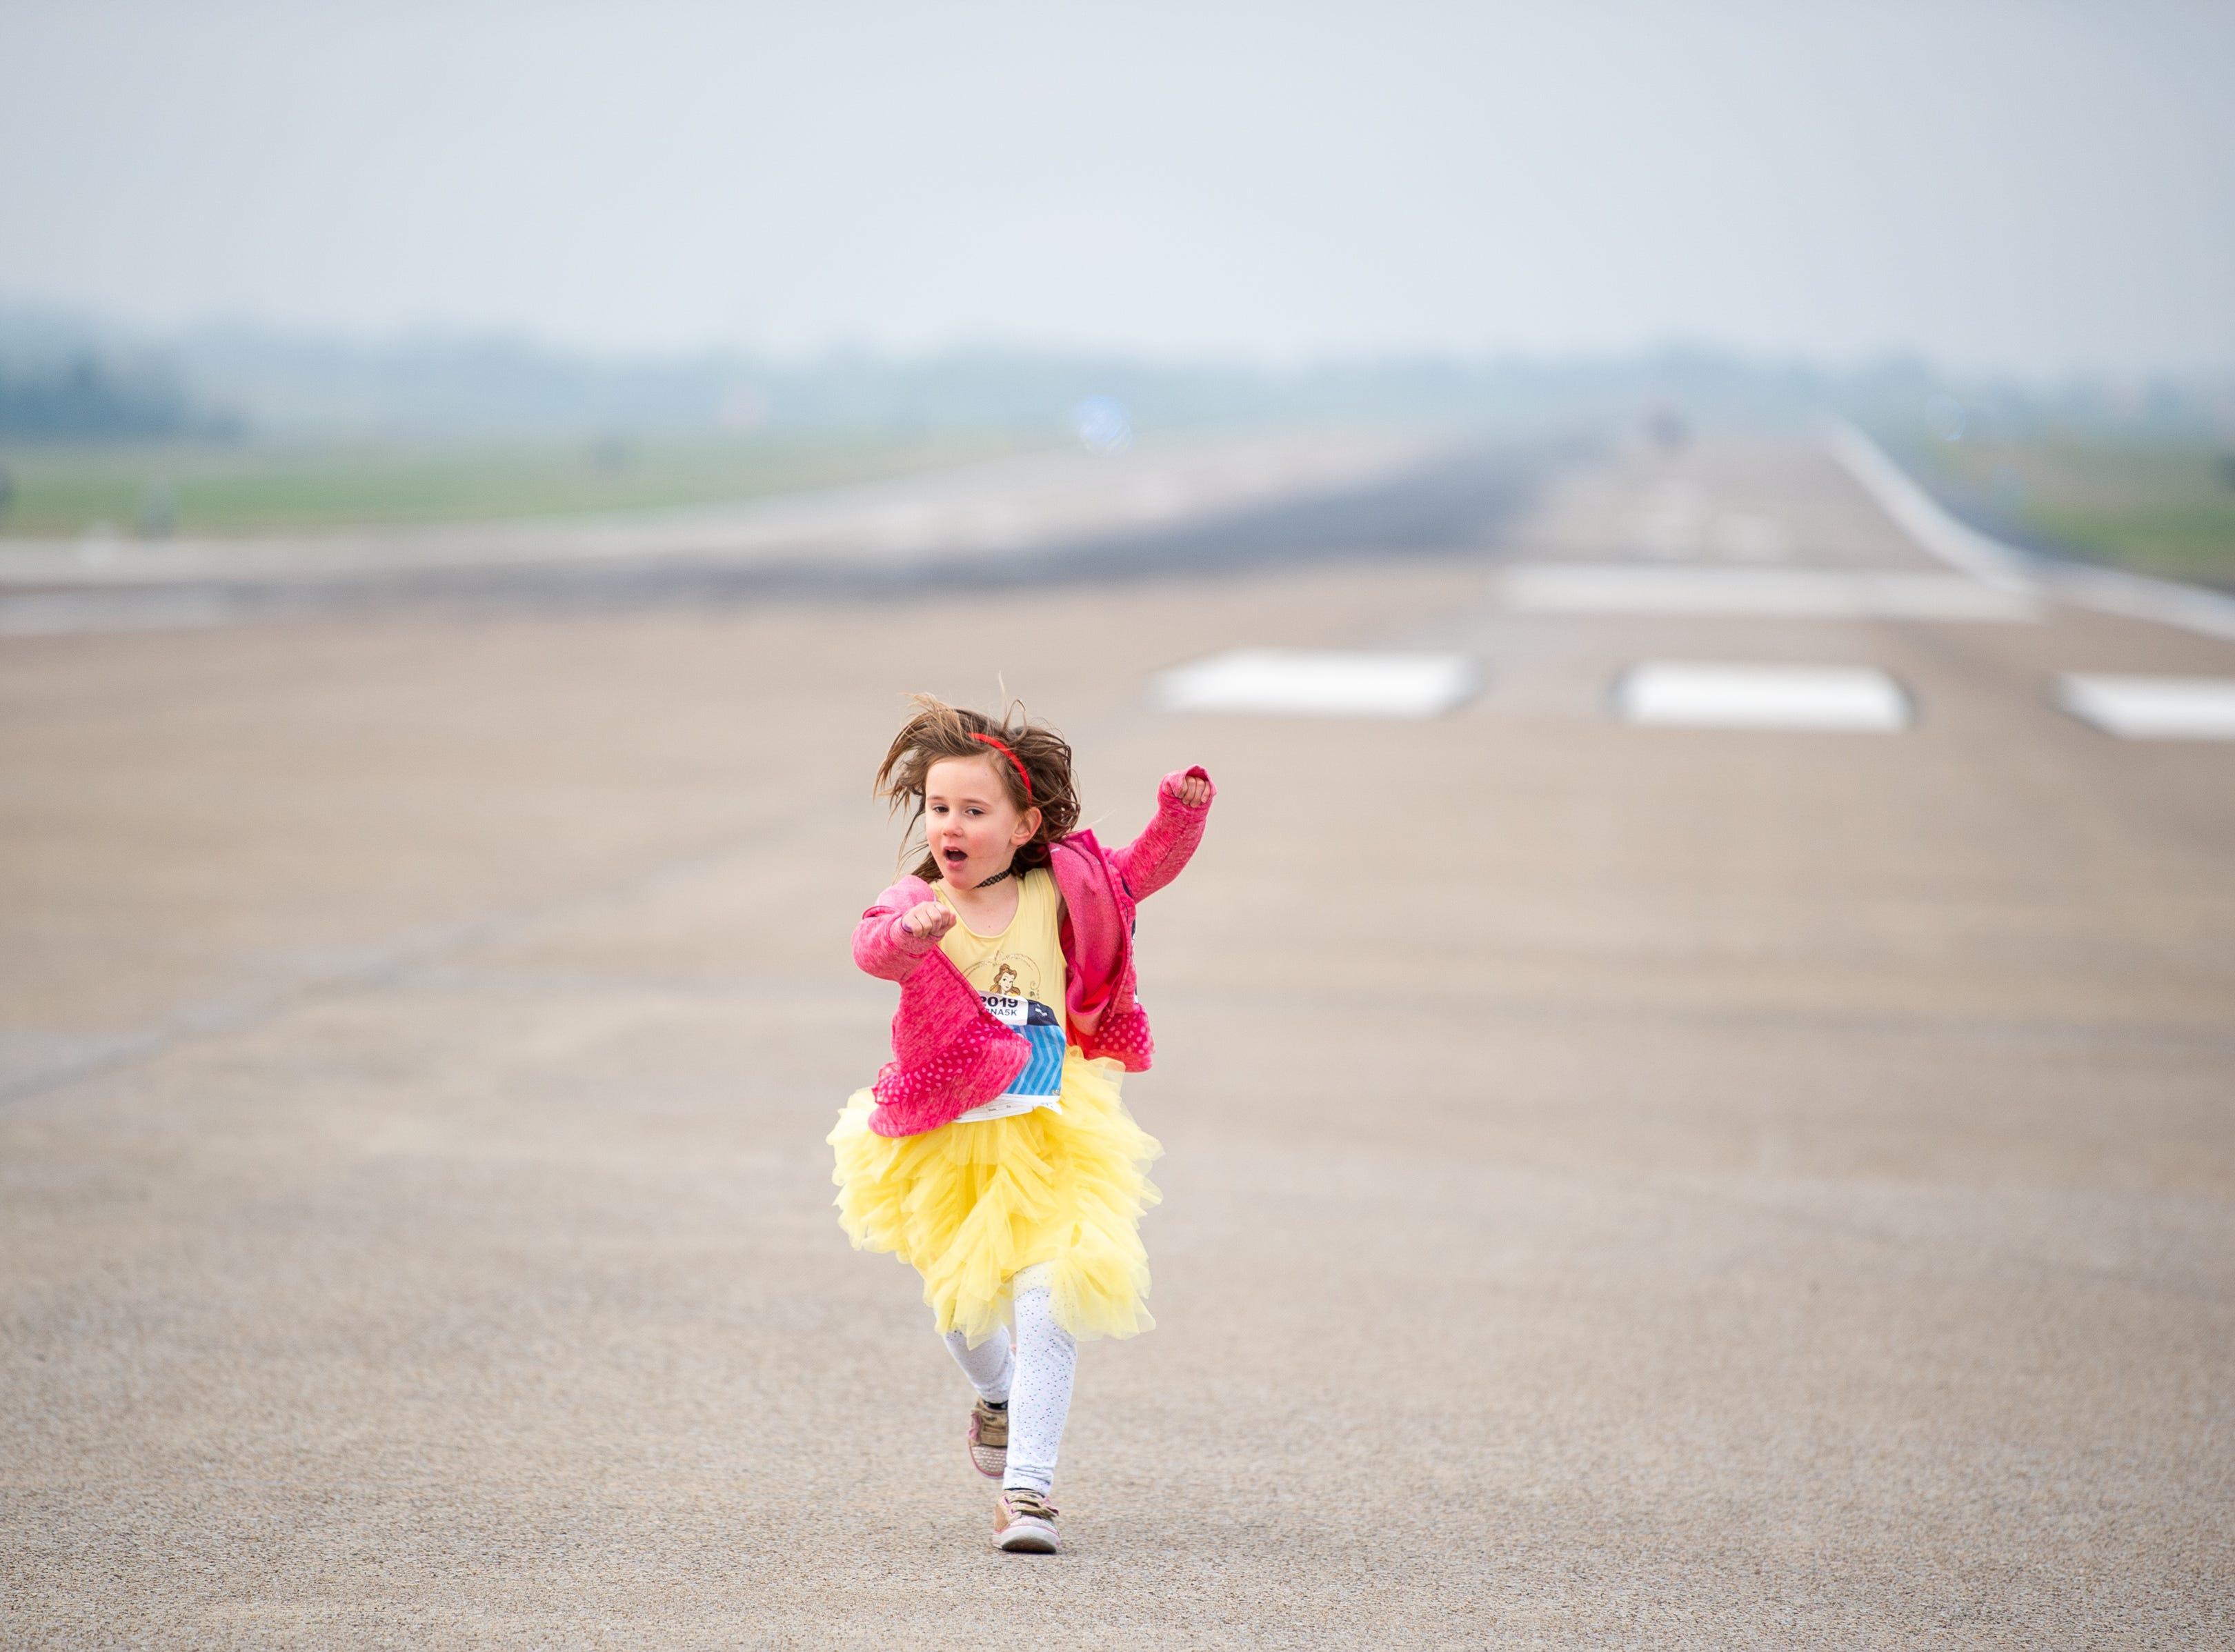 Ella Sward, 4, runs down Runway 2R/20L before the BNA 5K on the Runway at Nashville International Airport on Saturday, April 6, 2019, in Nashville, Tenn.